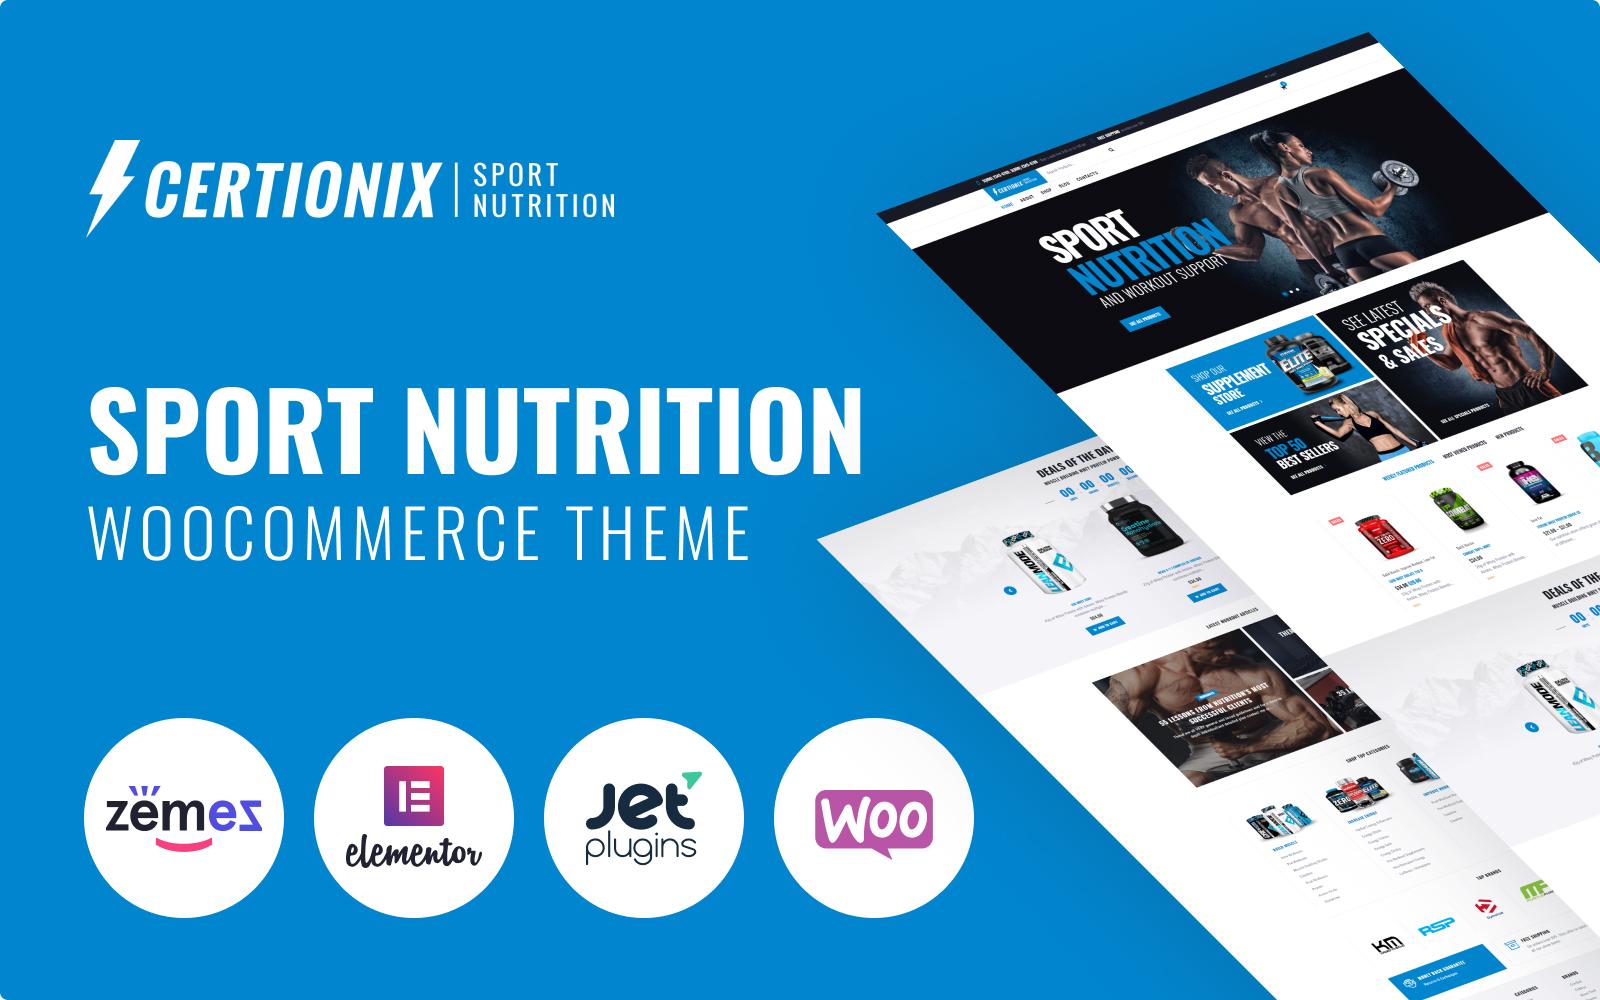 """Certionix - Sport Nutrition Website Template with Woocommerce and Elementor"" thème WooCommerce adaptatif #65870 - screenshot"